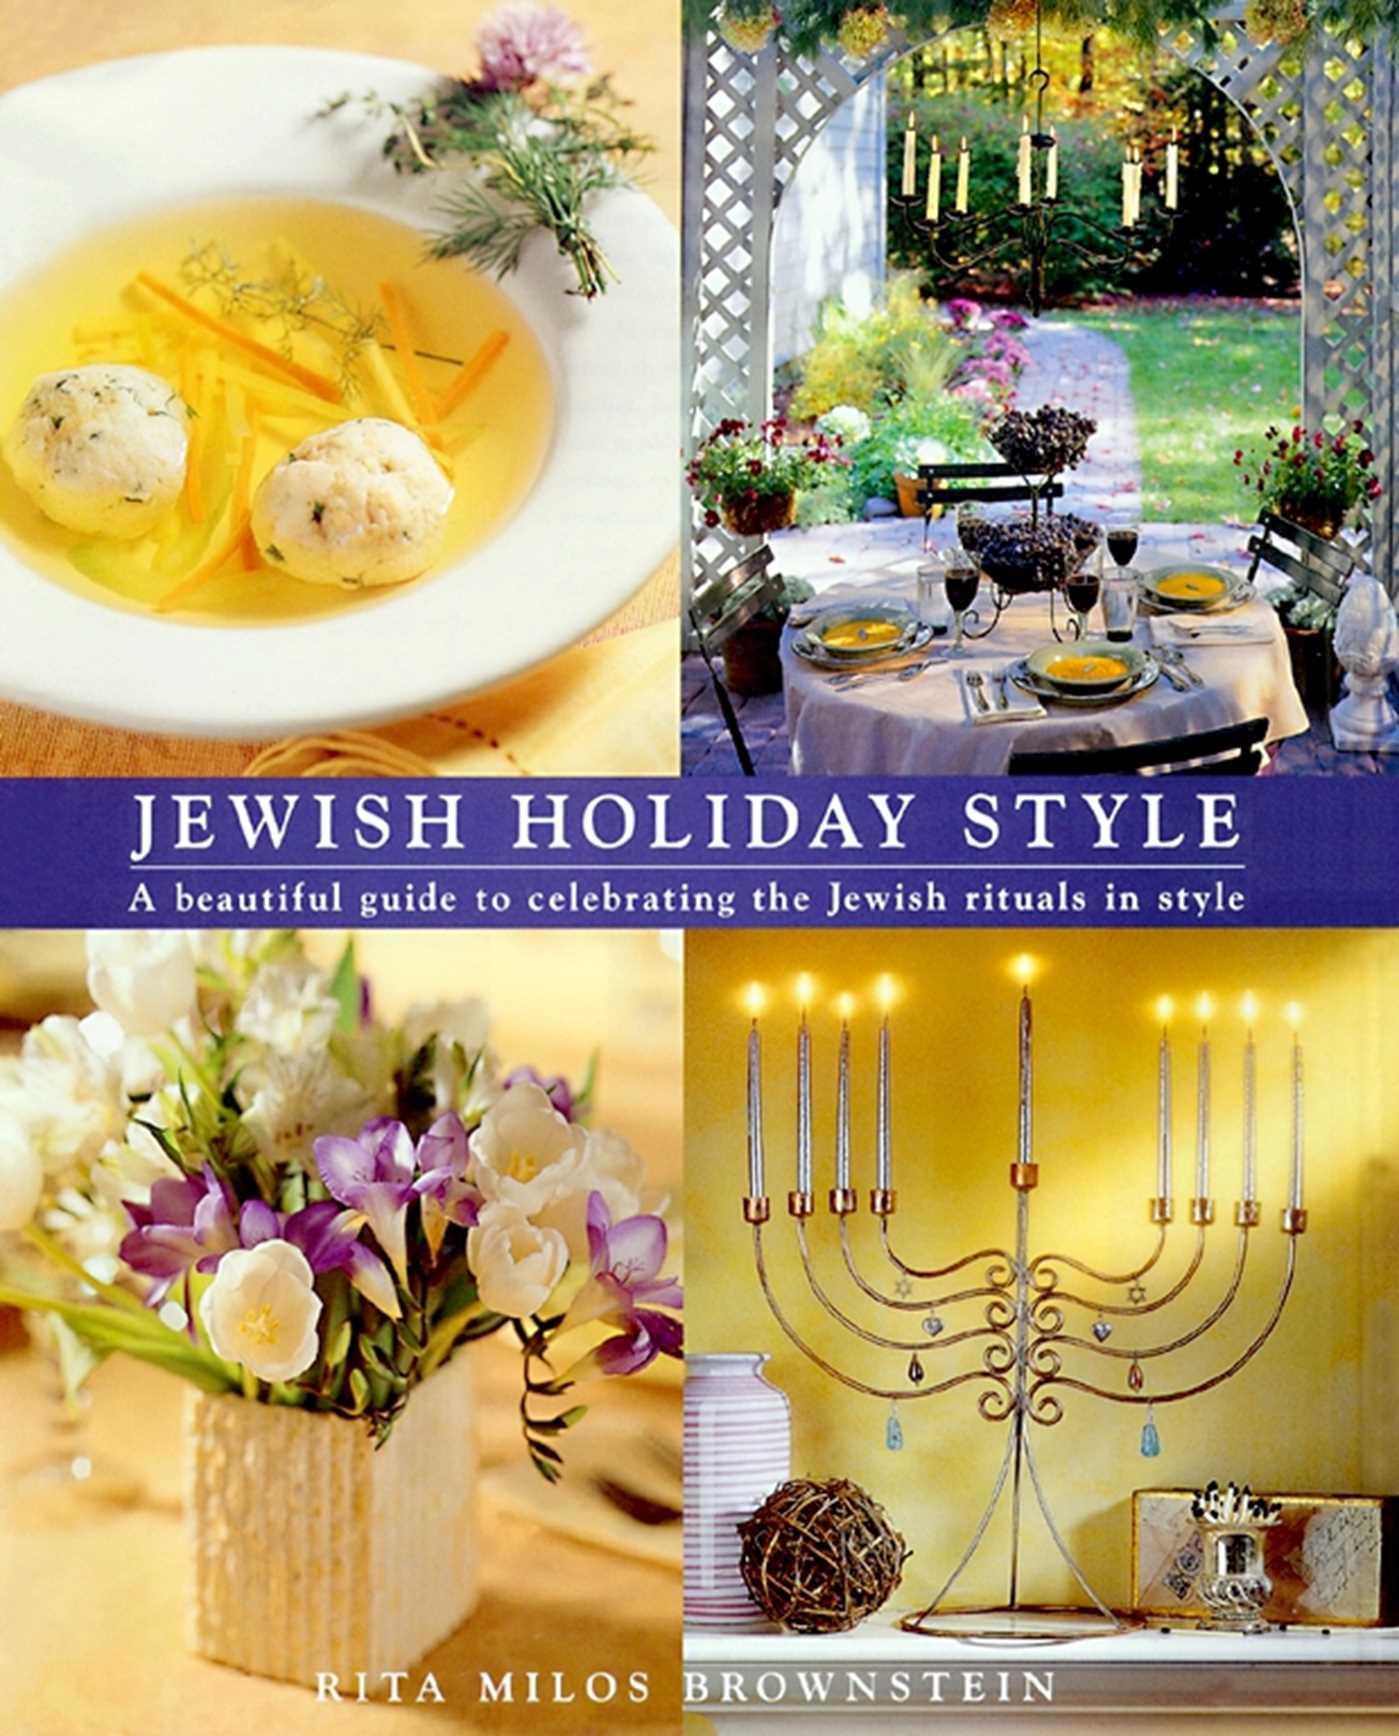 Jewish holiday style 9781439104217 hr